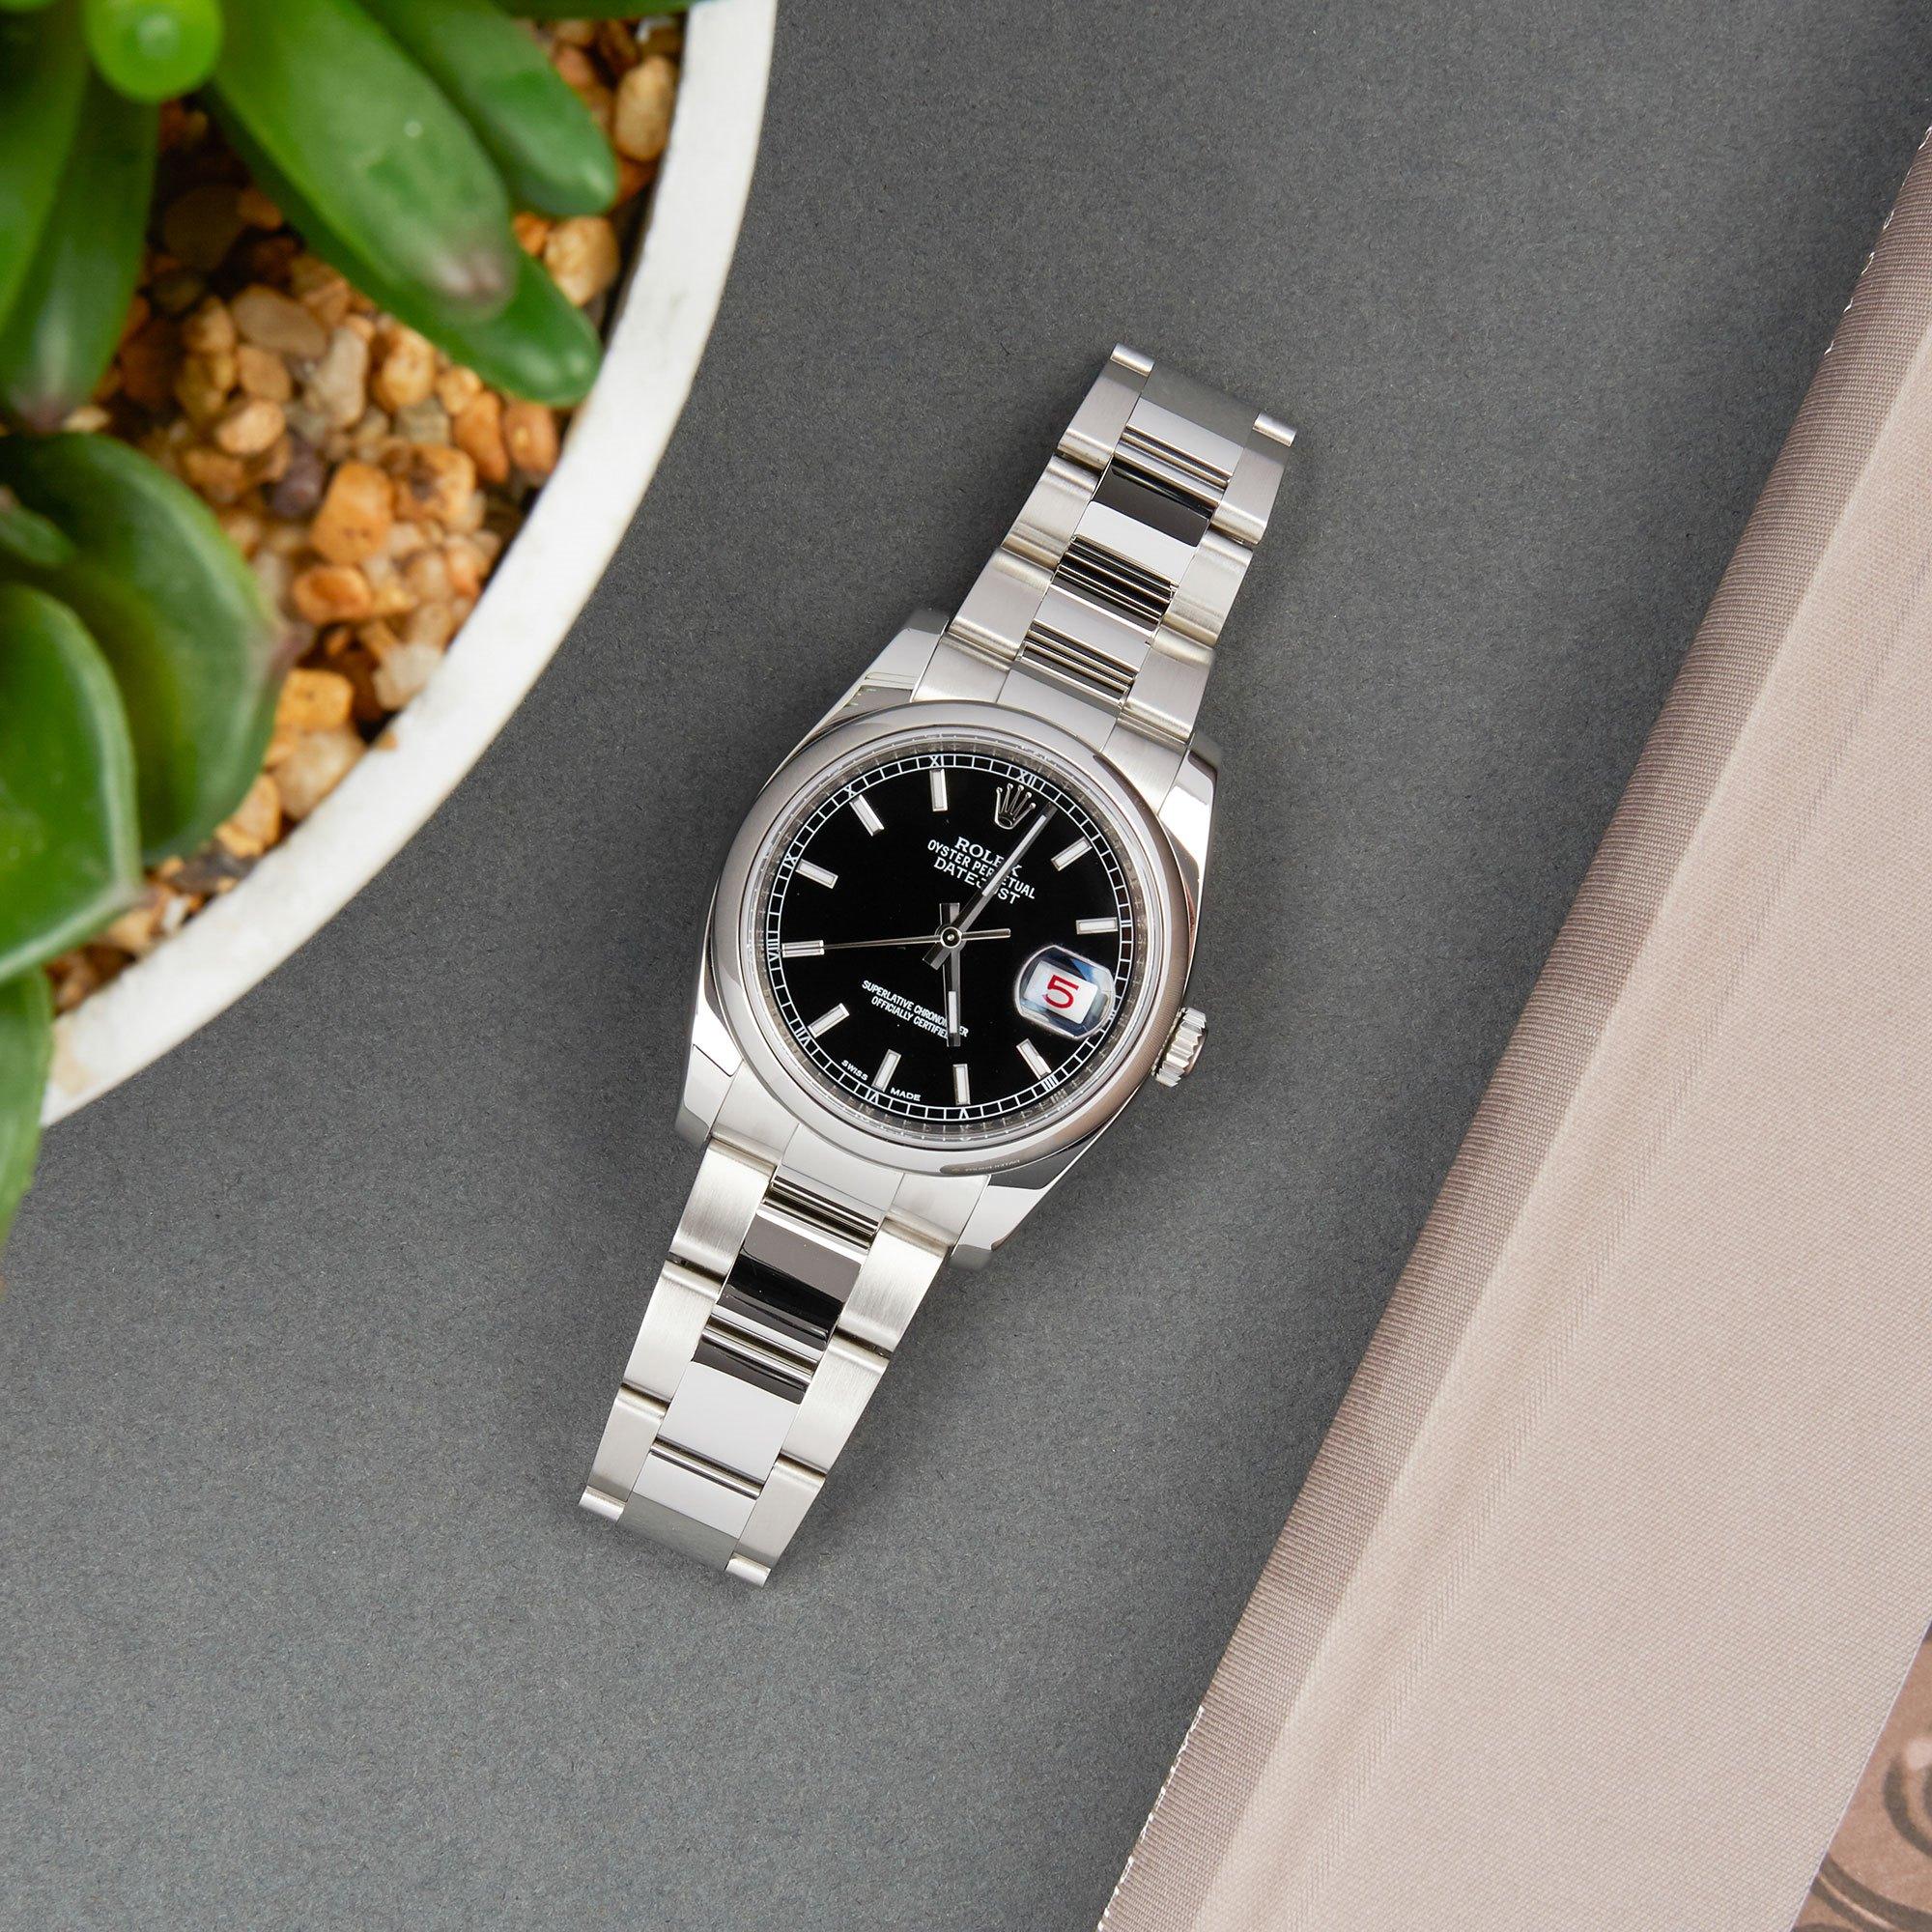 Rolex Datejust 36 Stainless Steel 116200